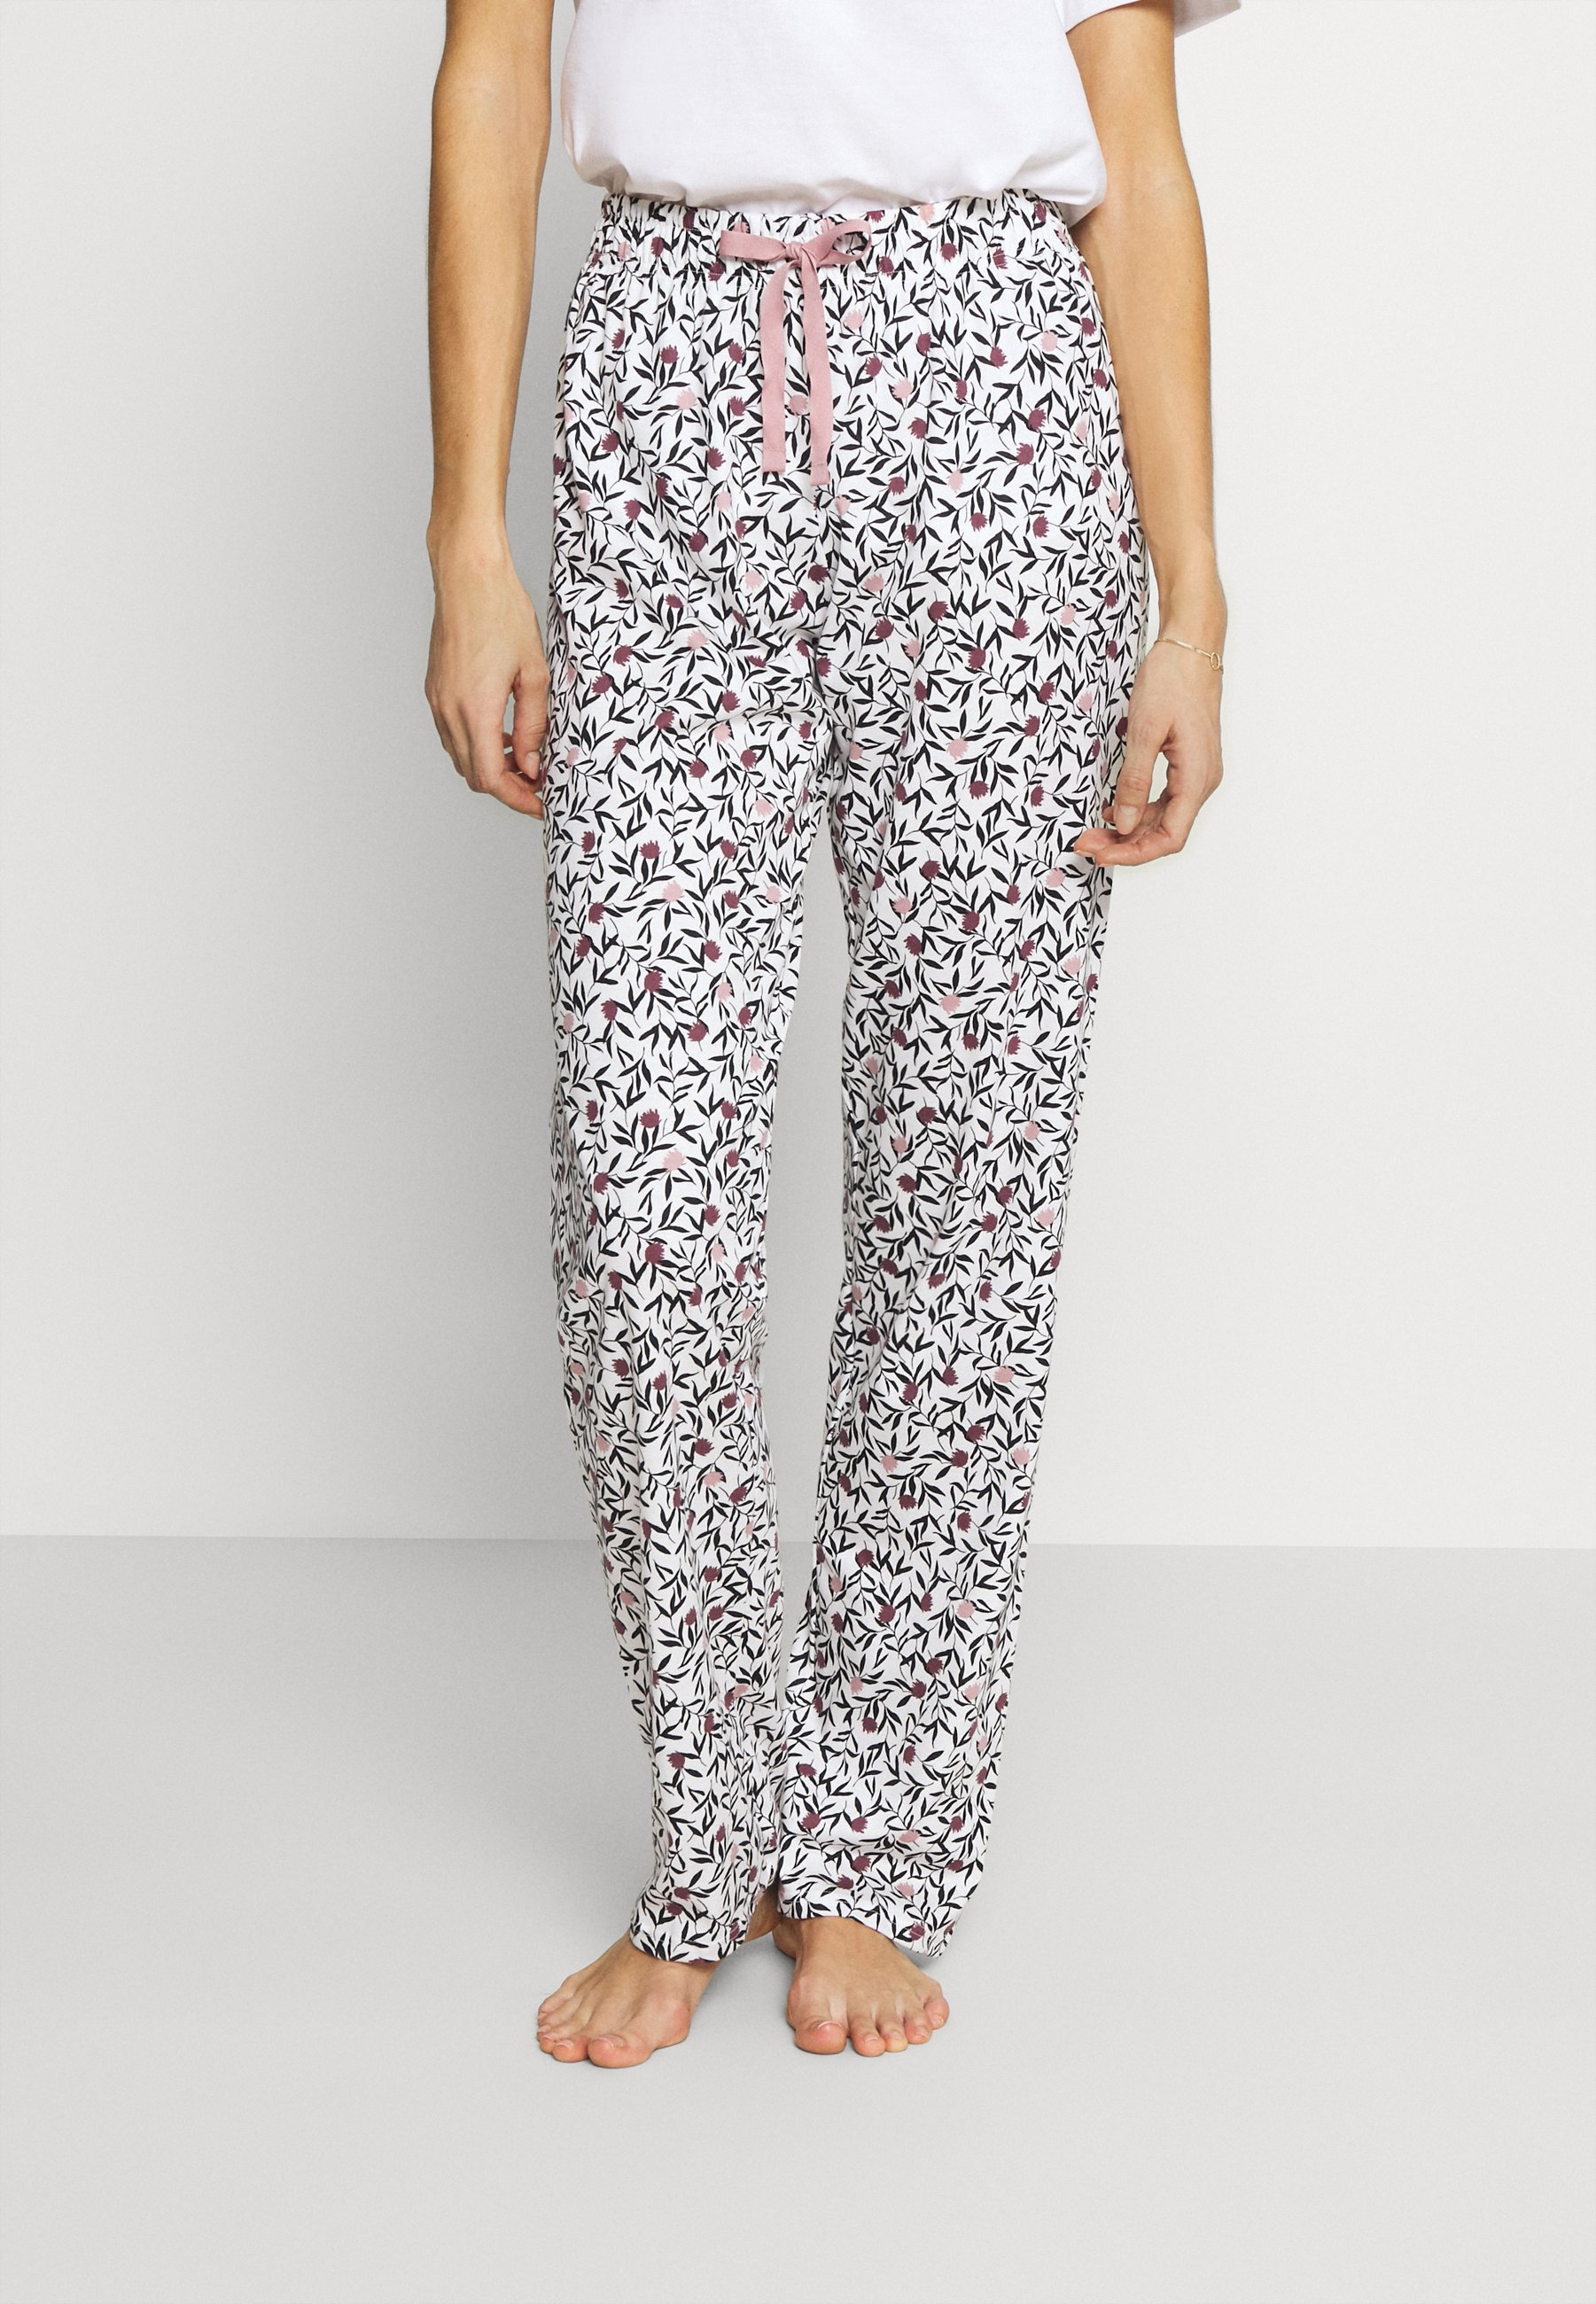 Donna FAVOURITES DREAMS  - Pantaloni del pigiama